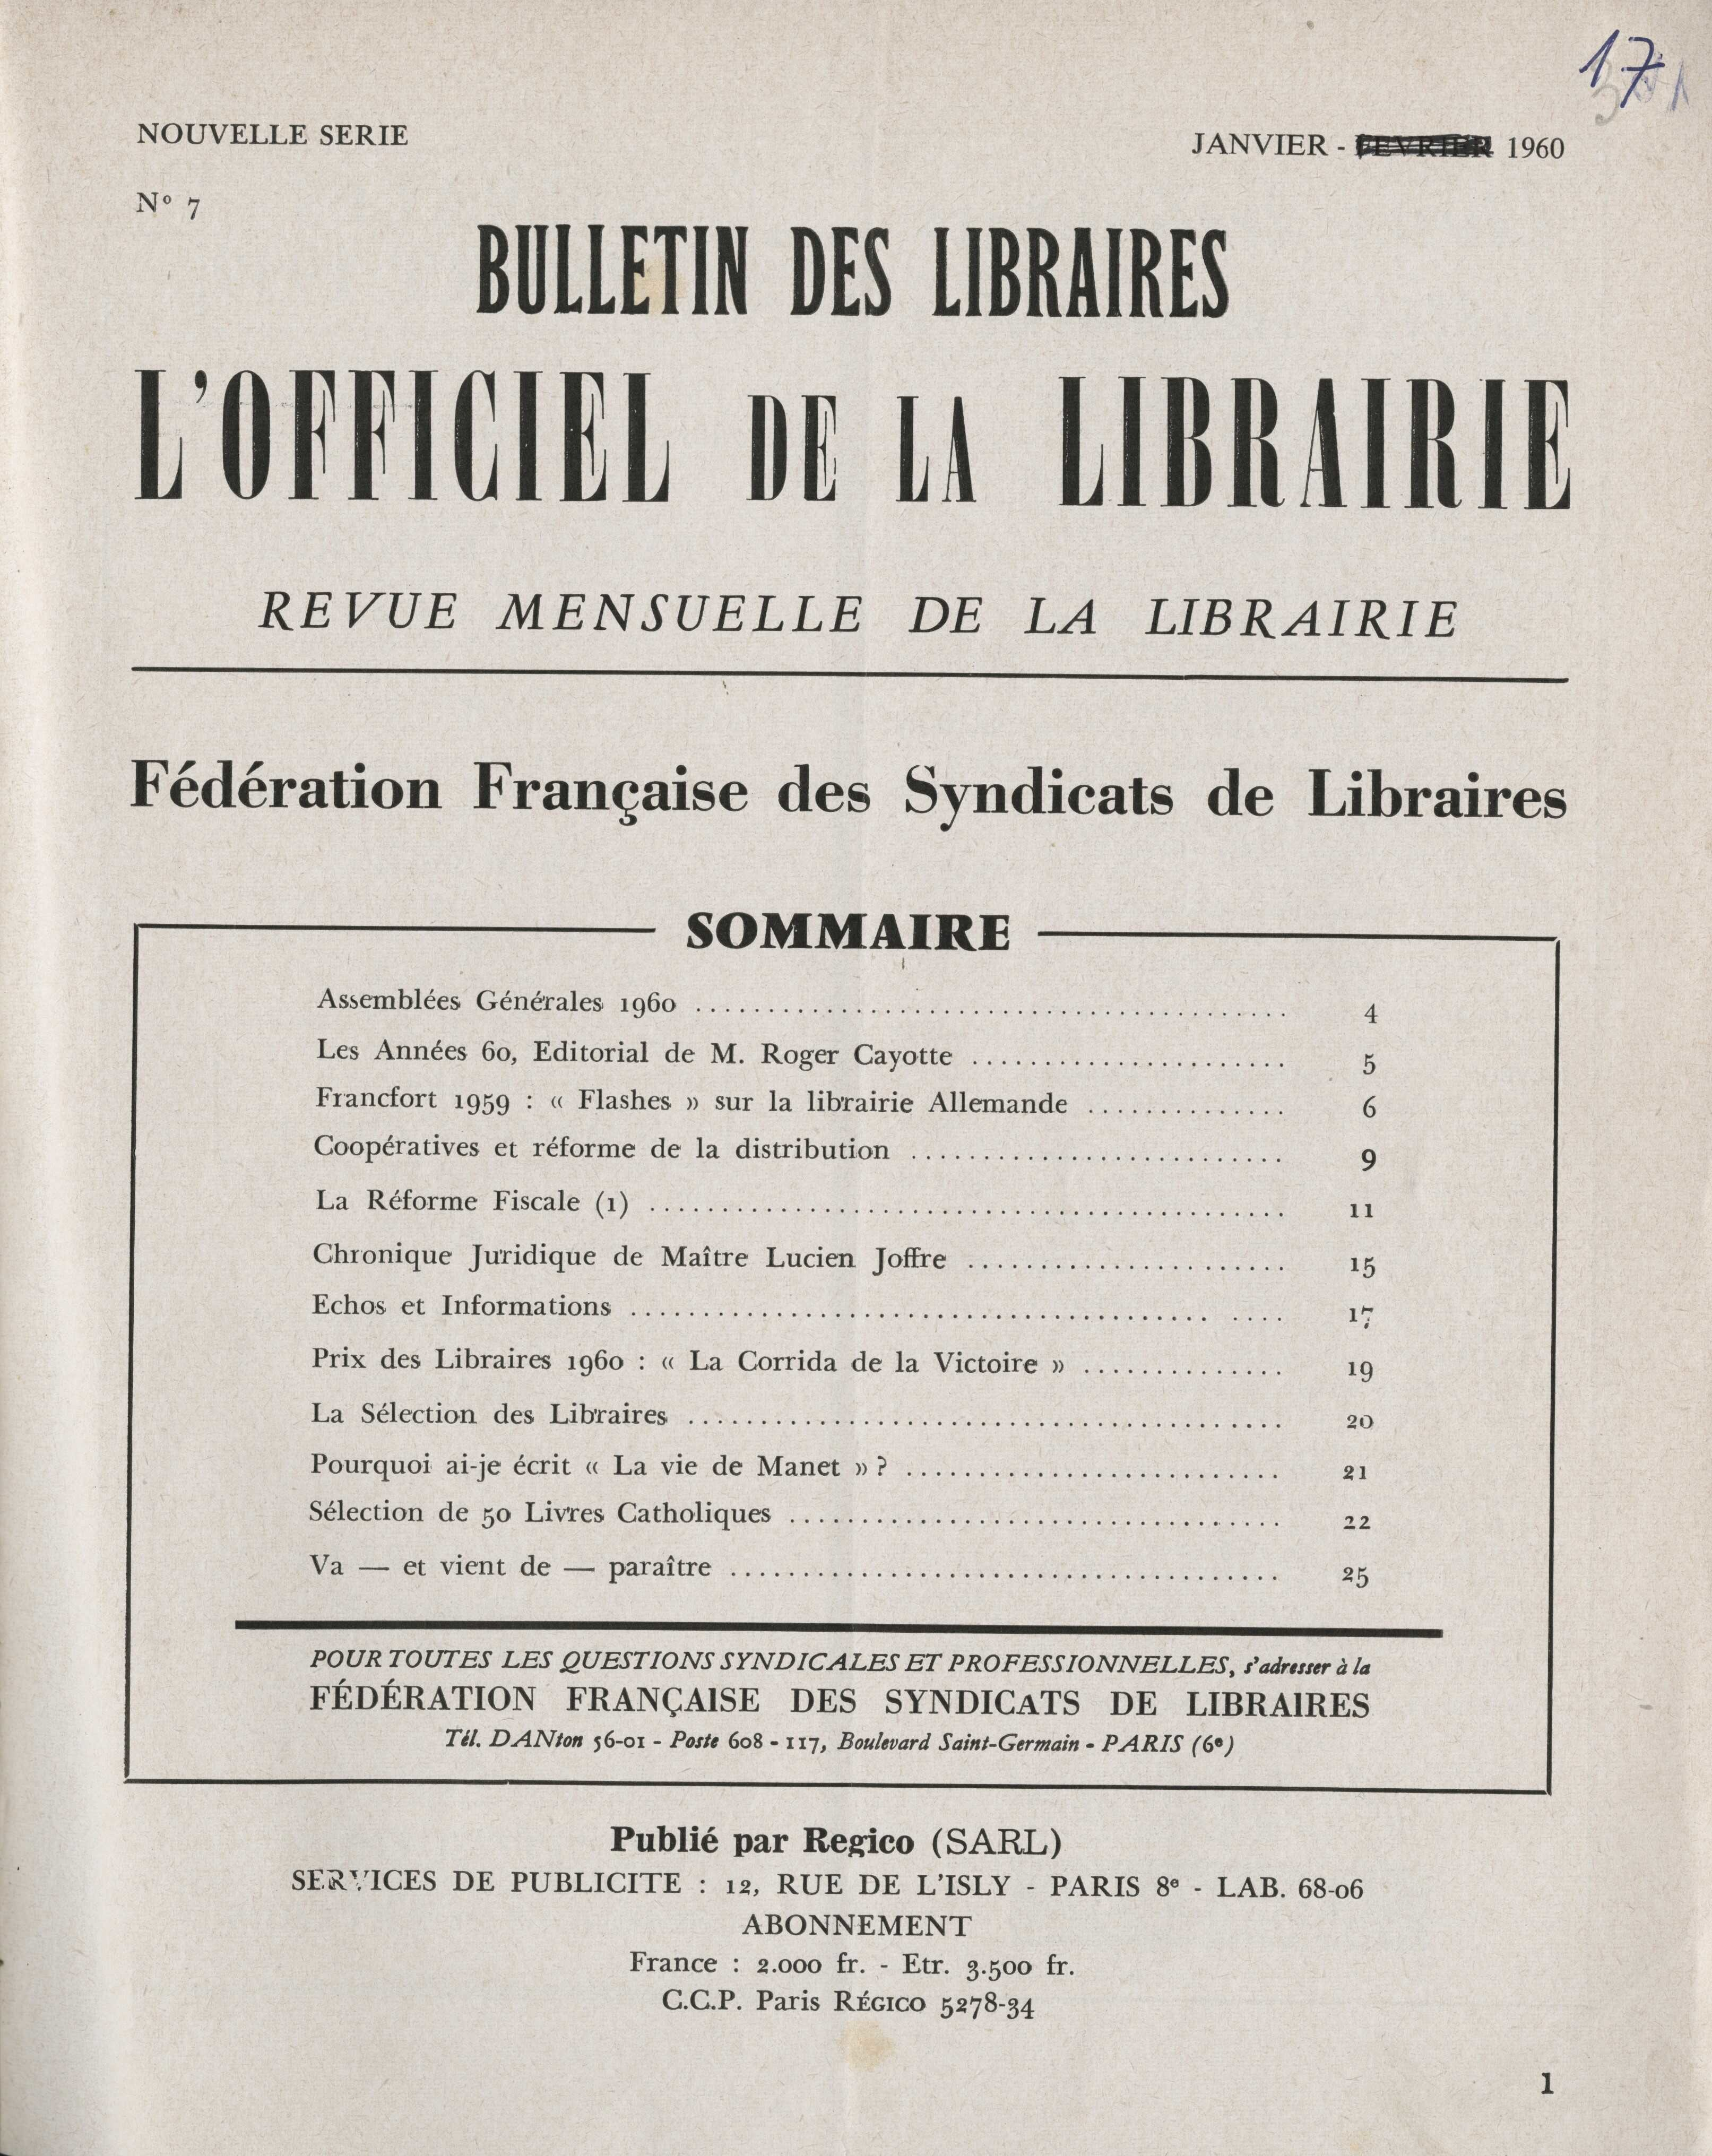 image for Formations et syndicats de libraires